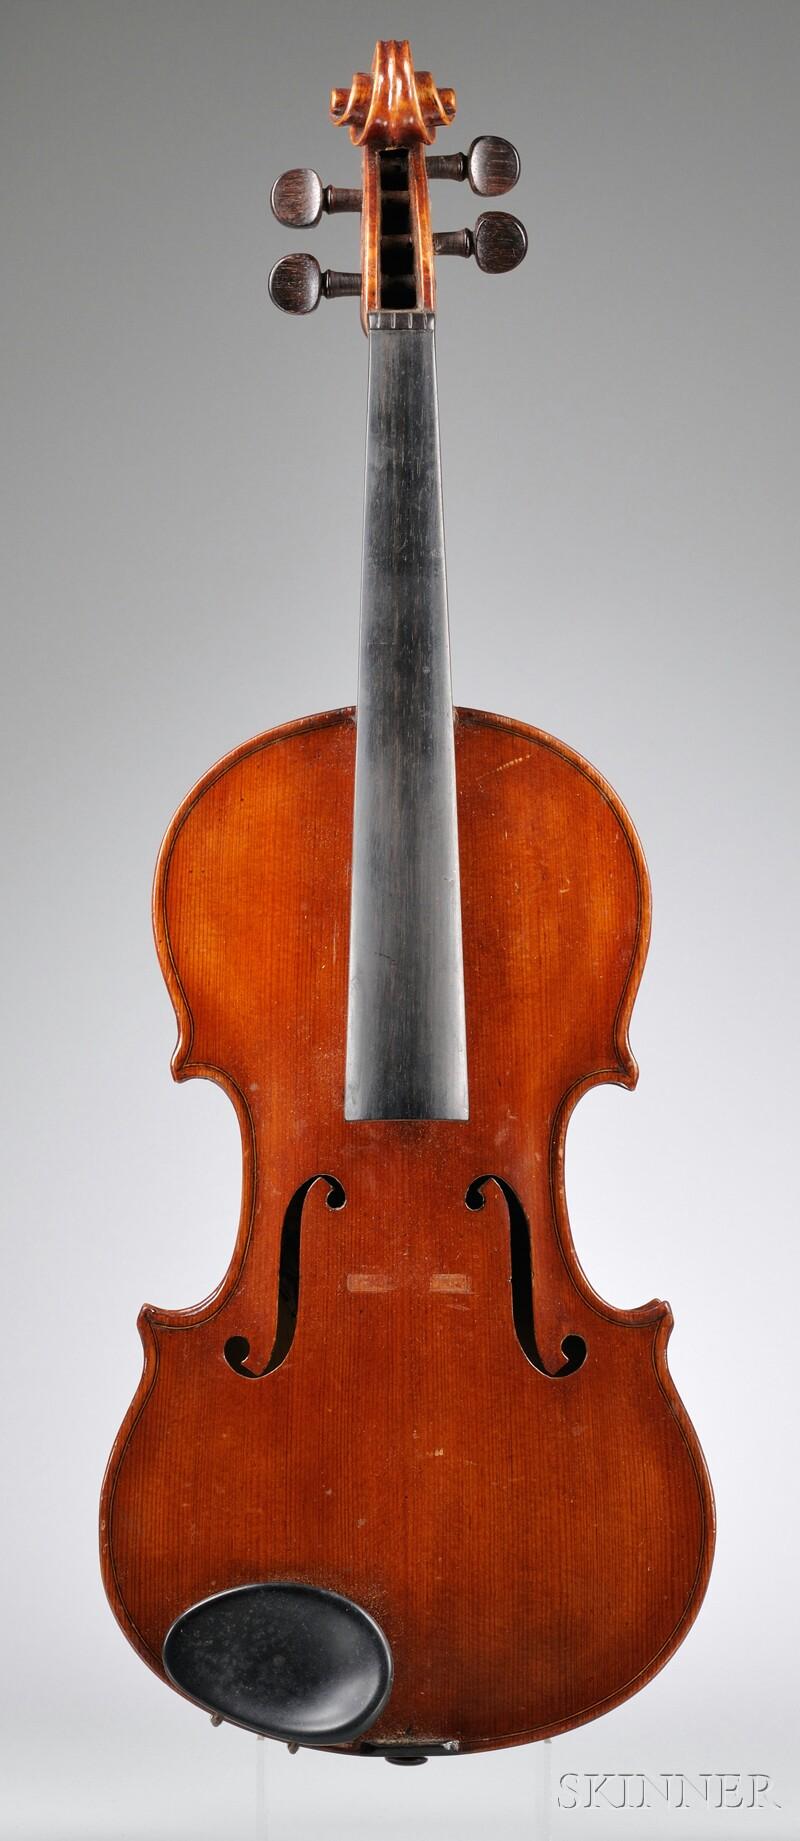 American Violin, c. 1940